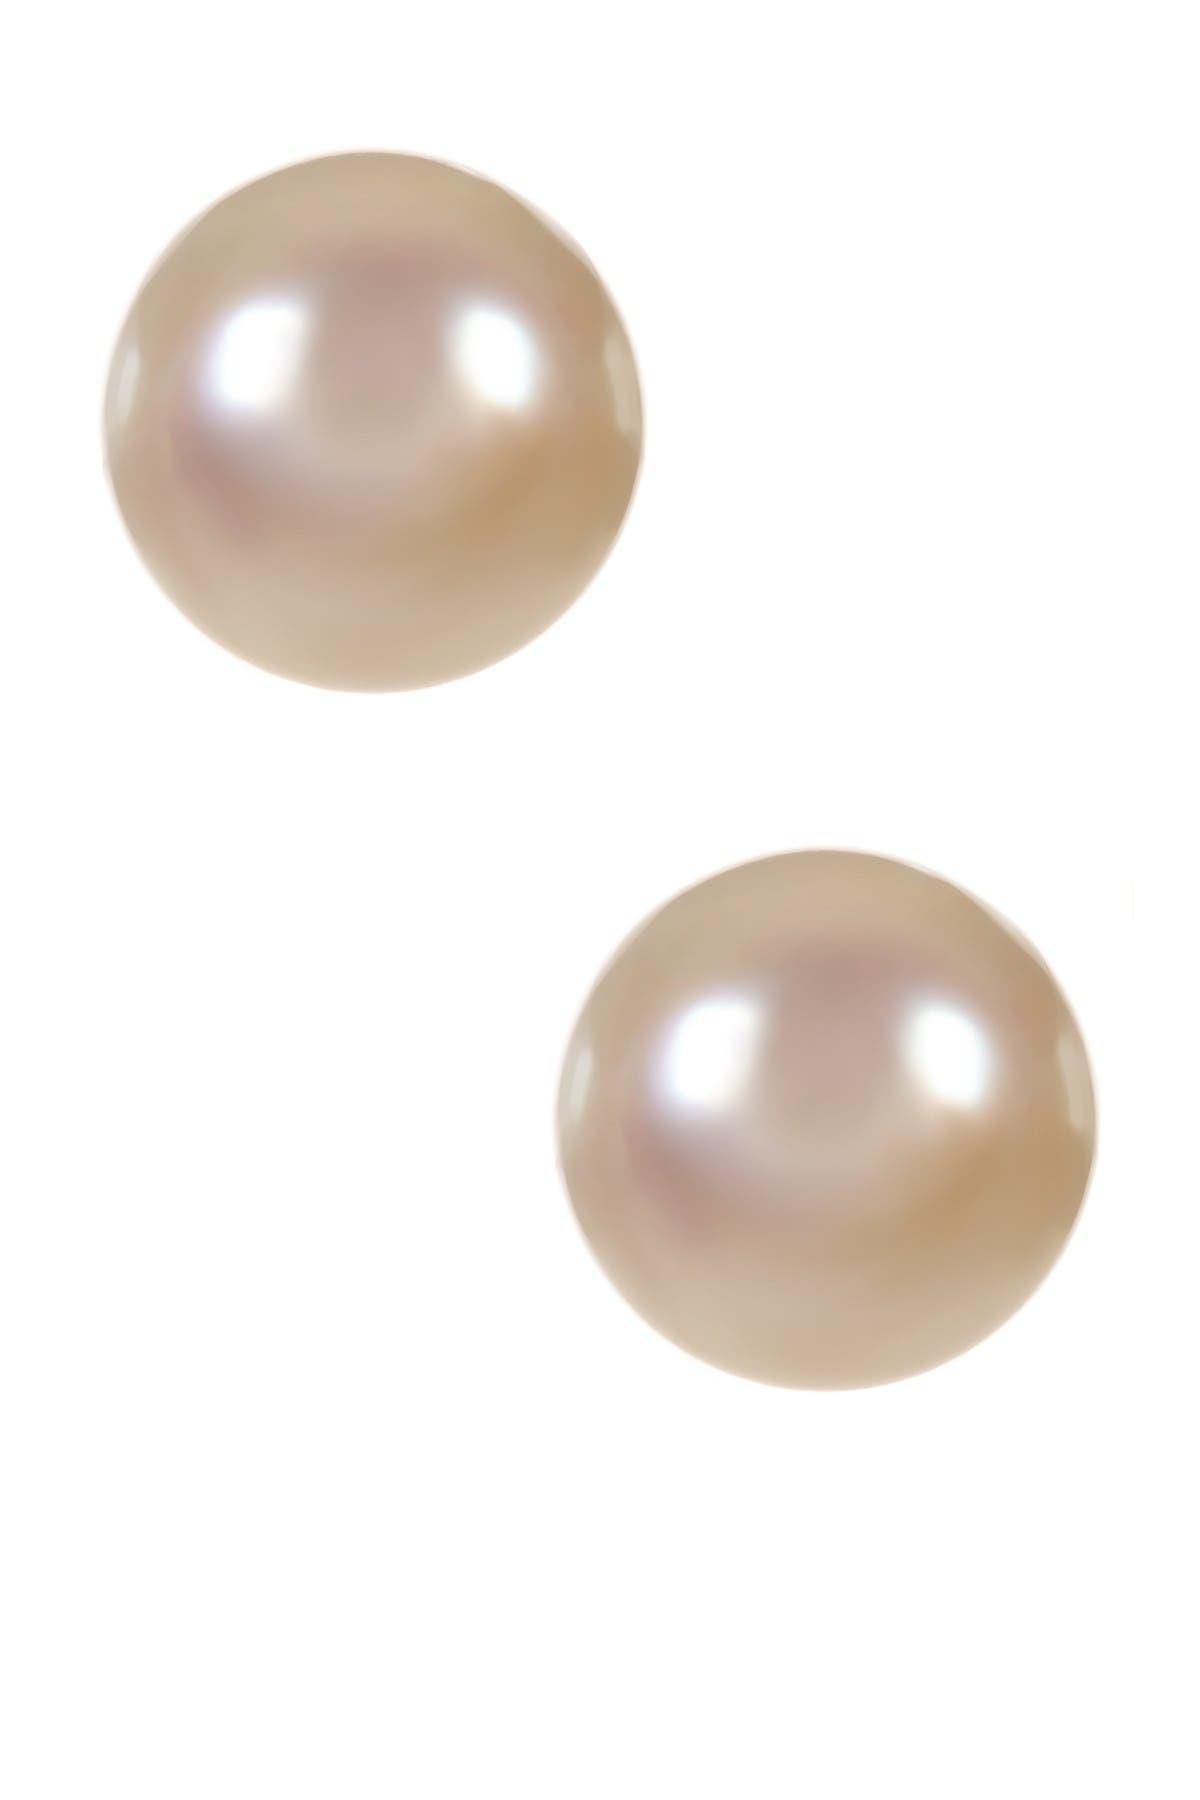 Splendid Pearls 14K Yellow Gold 11-12mm White Freshwater Pearl Stud Earrings at Nordstrom Rack